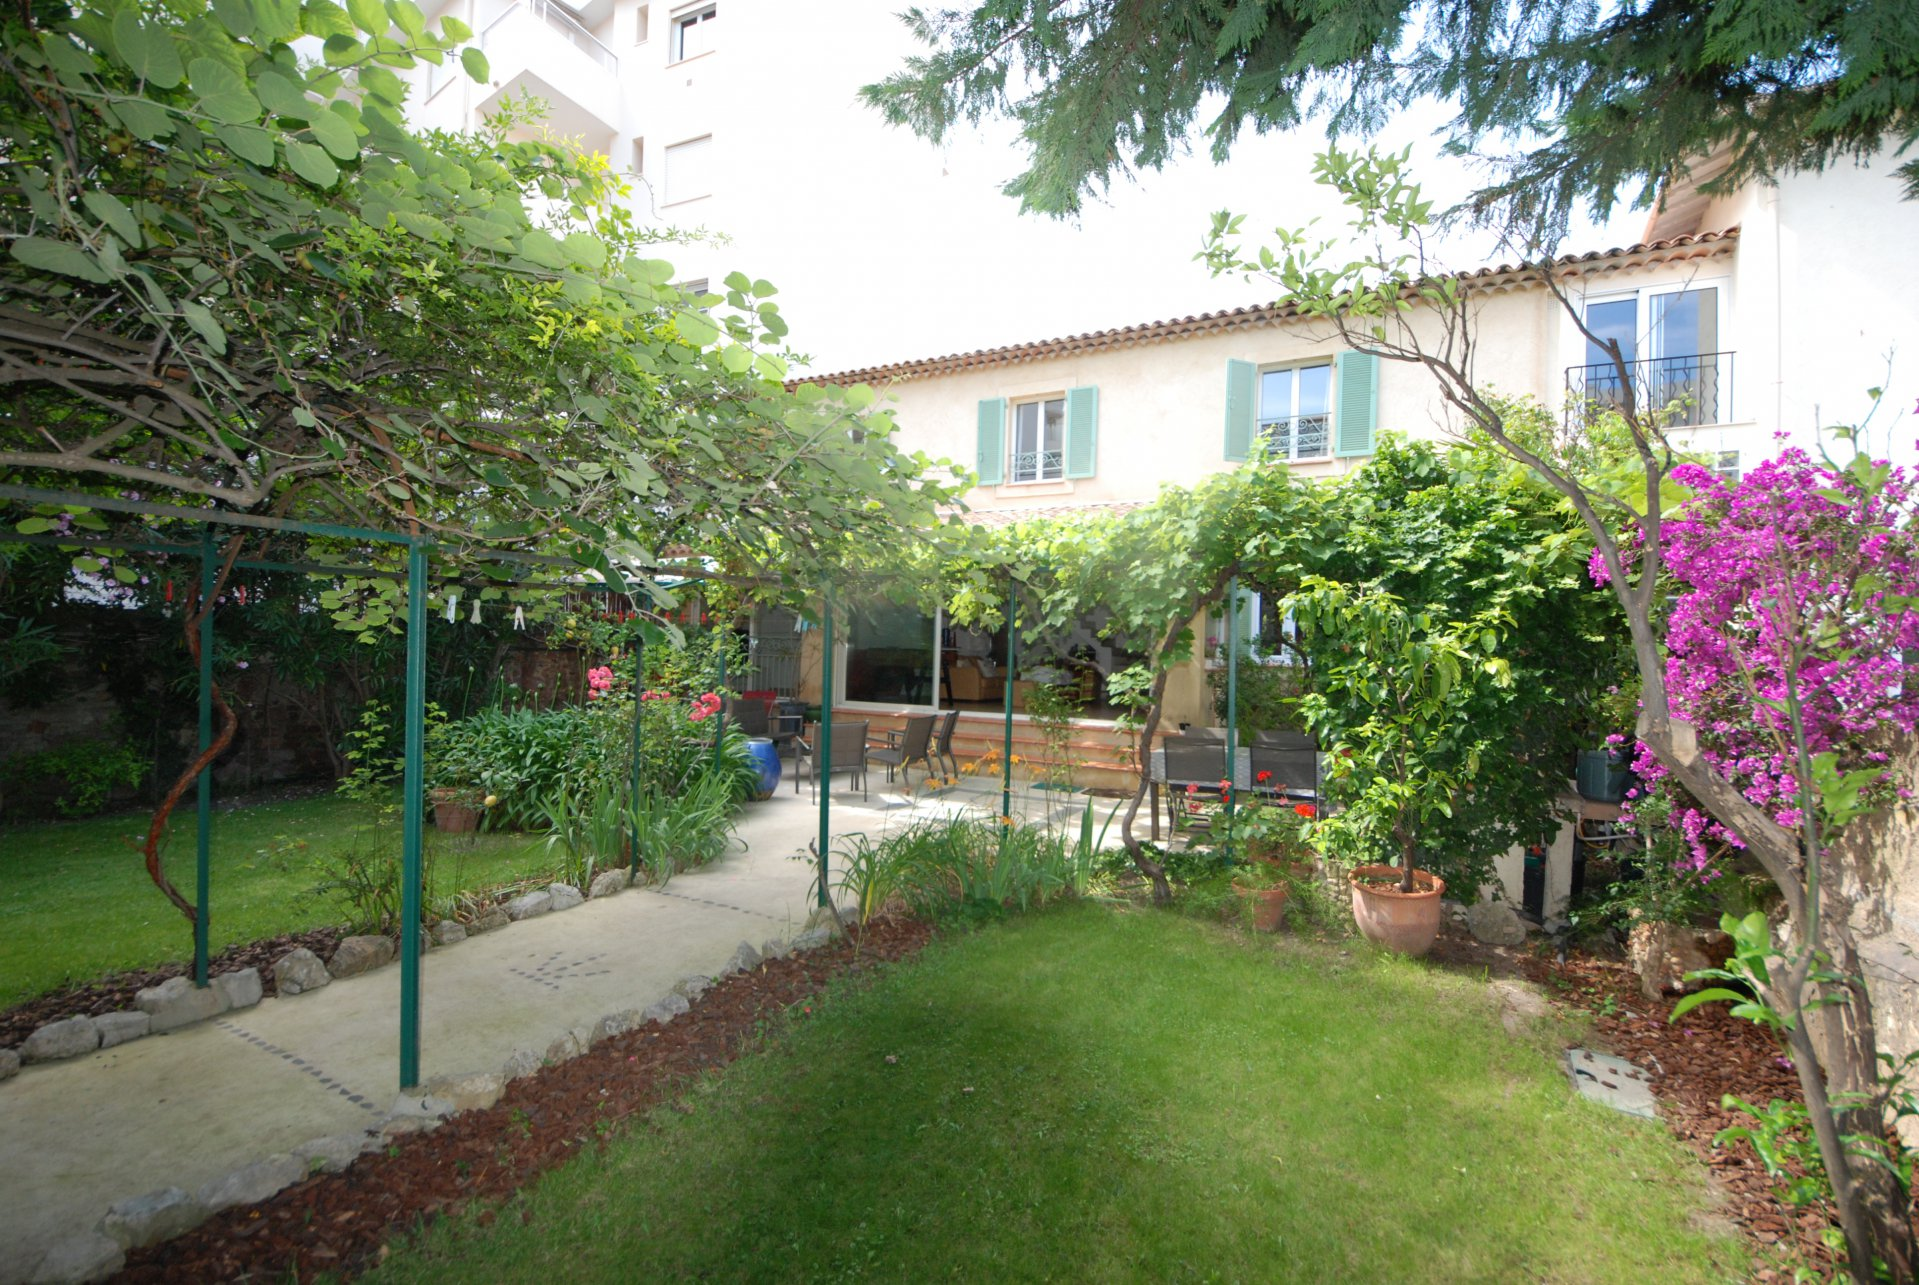 congress rental beach house 4 bedroom Palm Beach Cannes